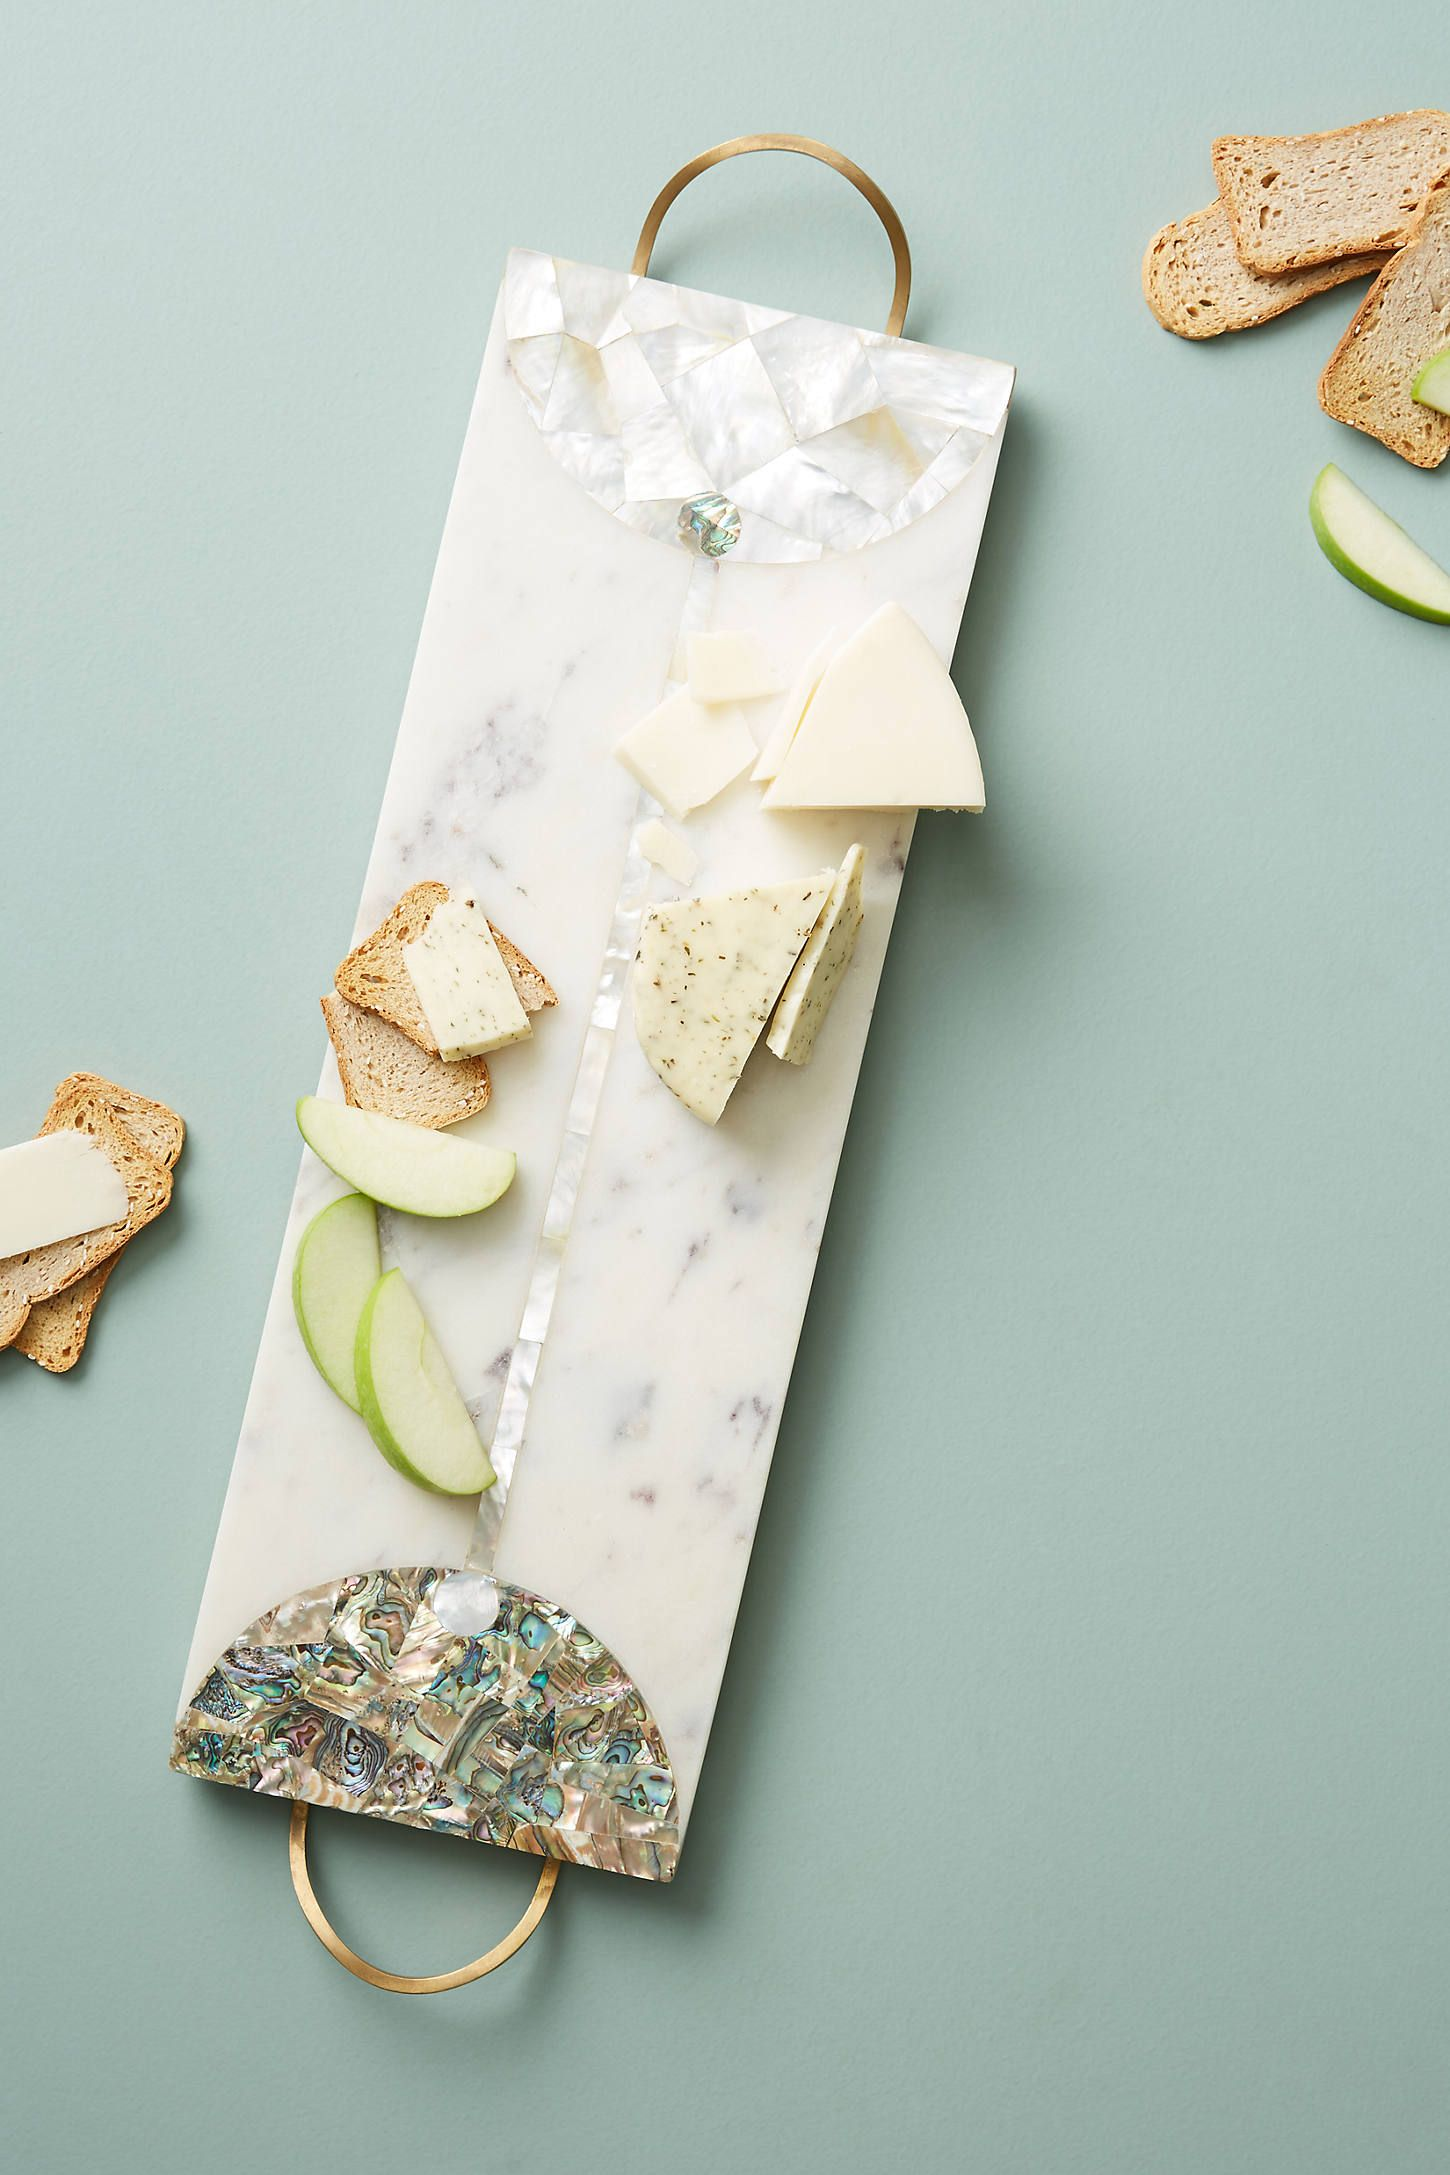 Nina Marble Cheese Board Marble Cheese Board Christmas Gifts